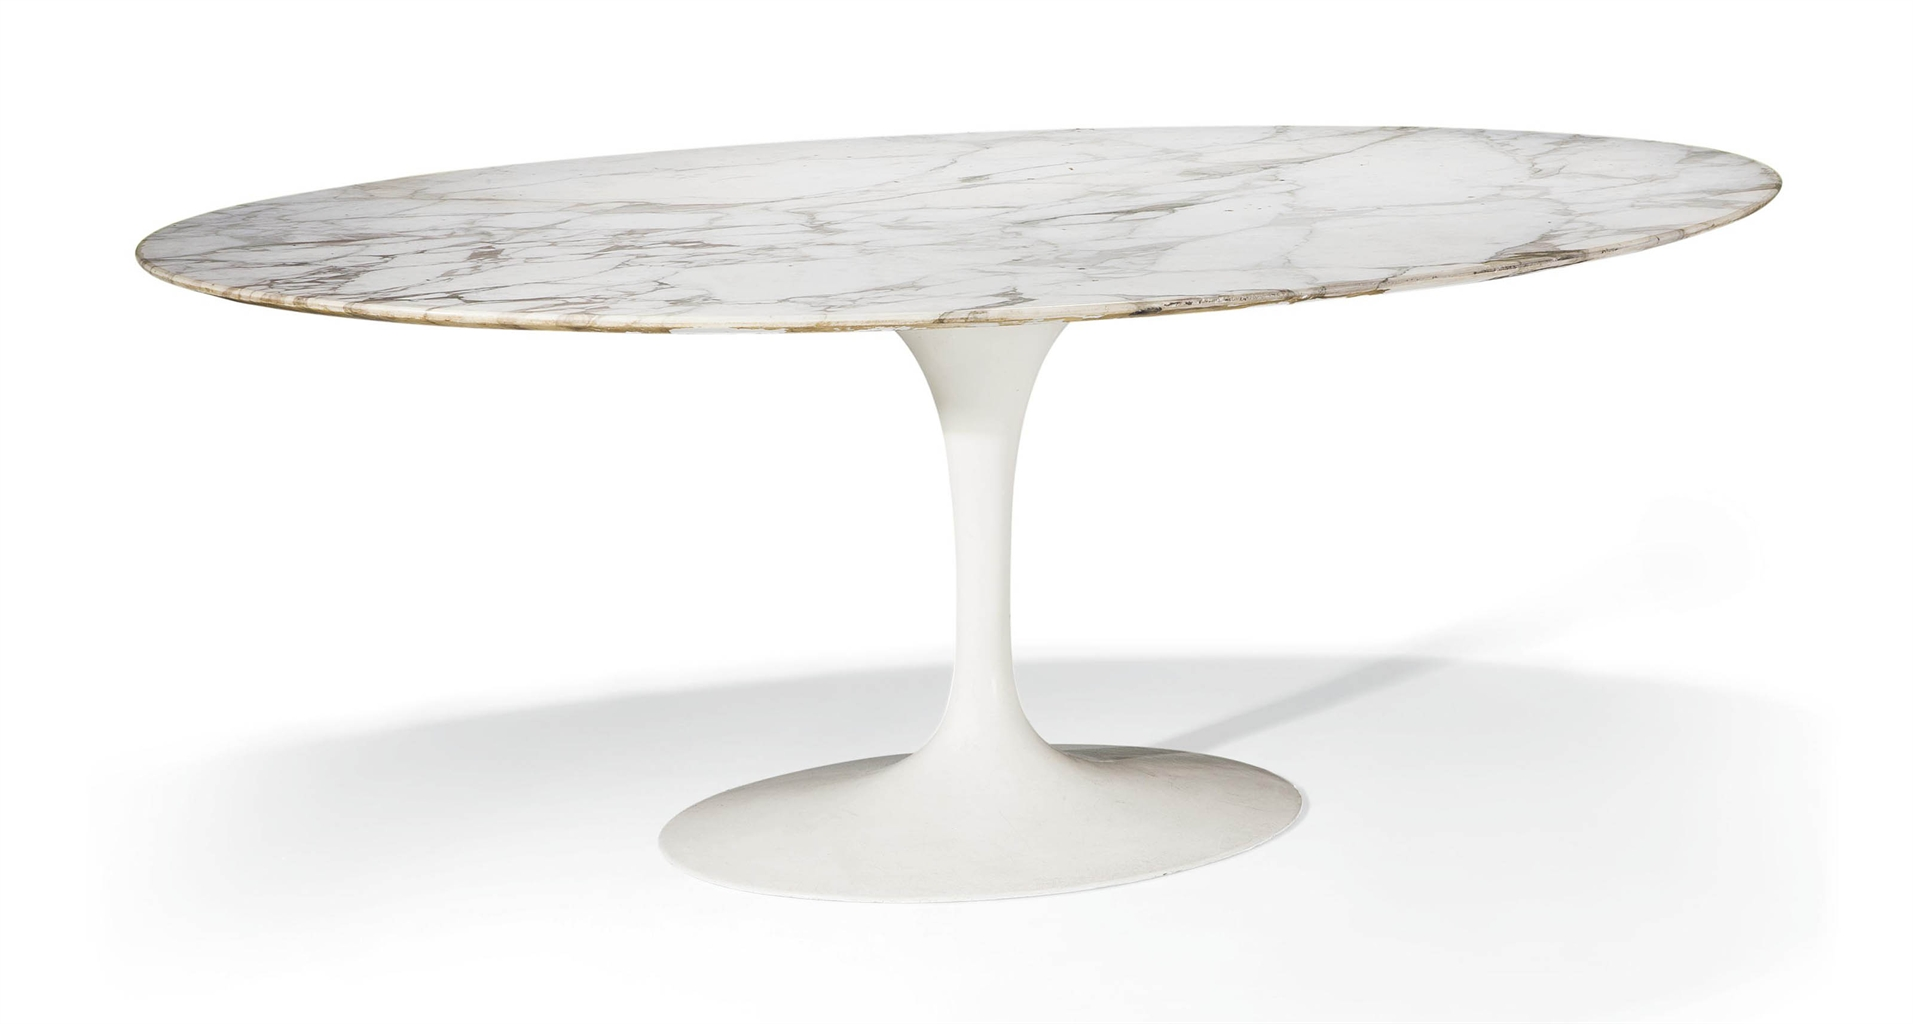 eero saarinen 1910 1961 table de salle manger 39 tulipe 39 le mod le cr en 1956 edition. Black Bedroom Furniture Sets. Home Design Ideas